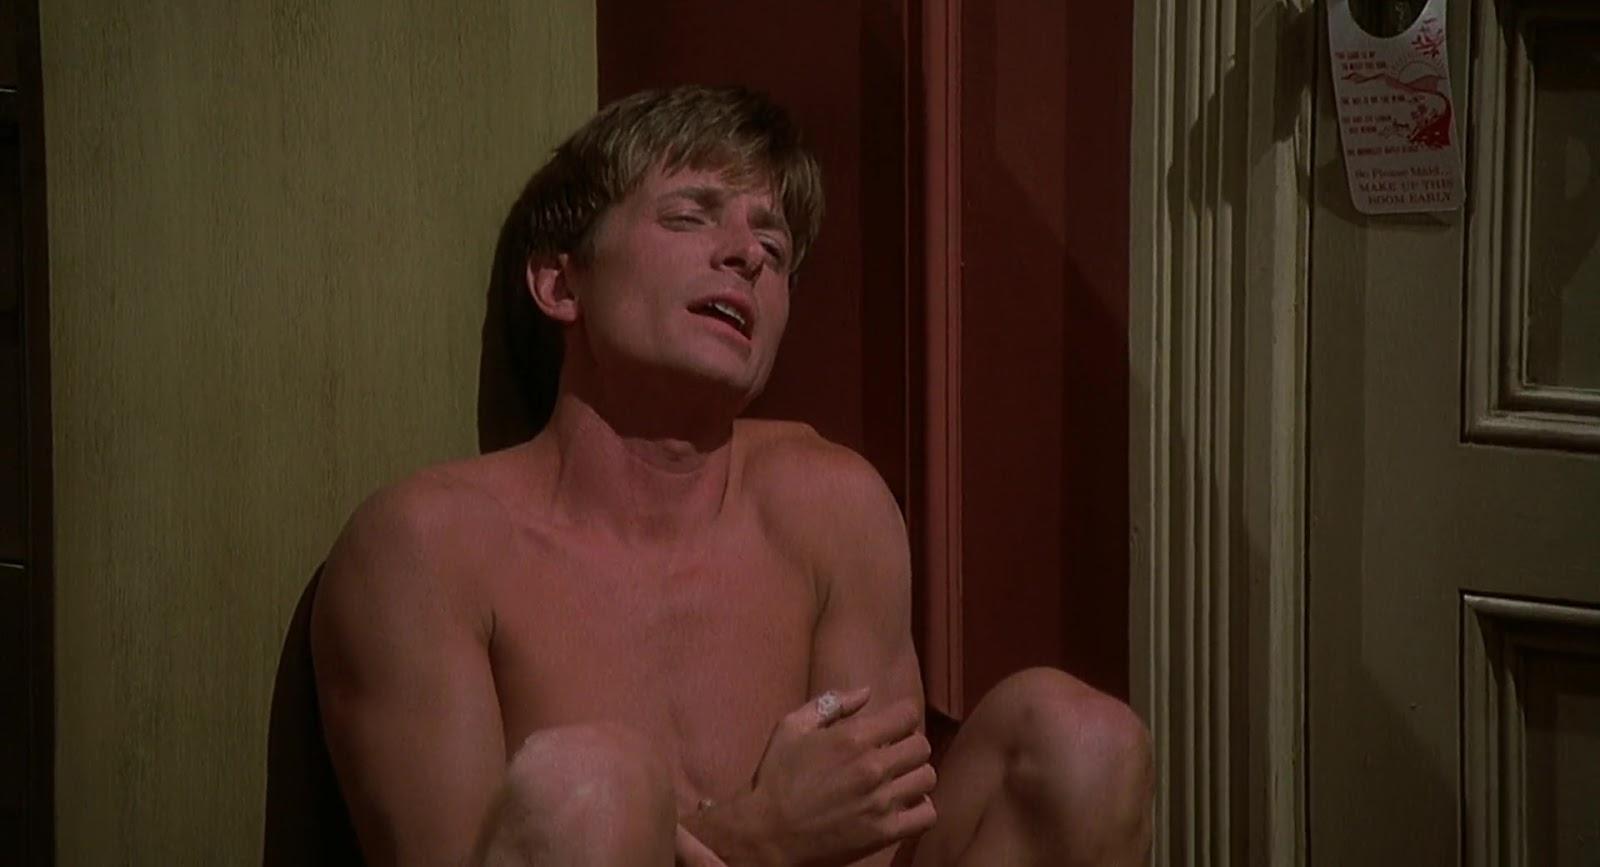 Free Michael J Fox Gay Nude